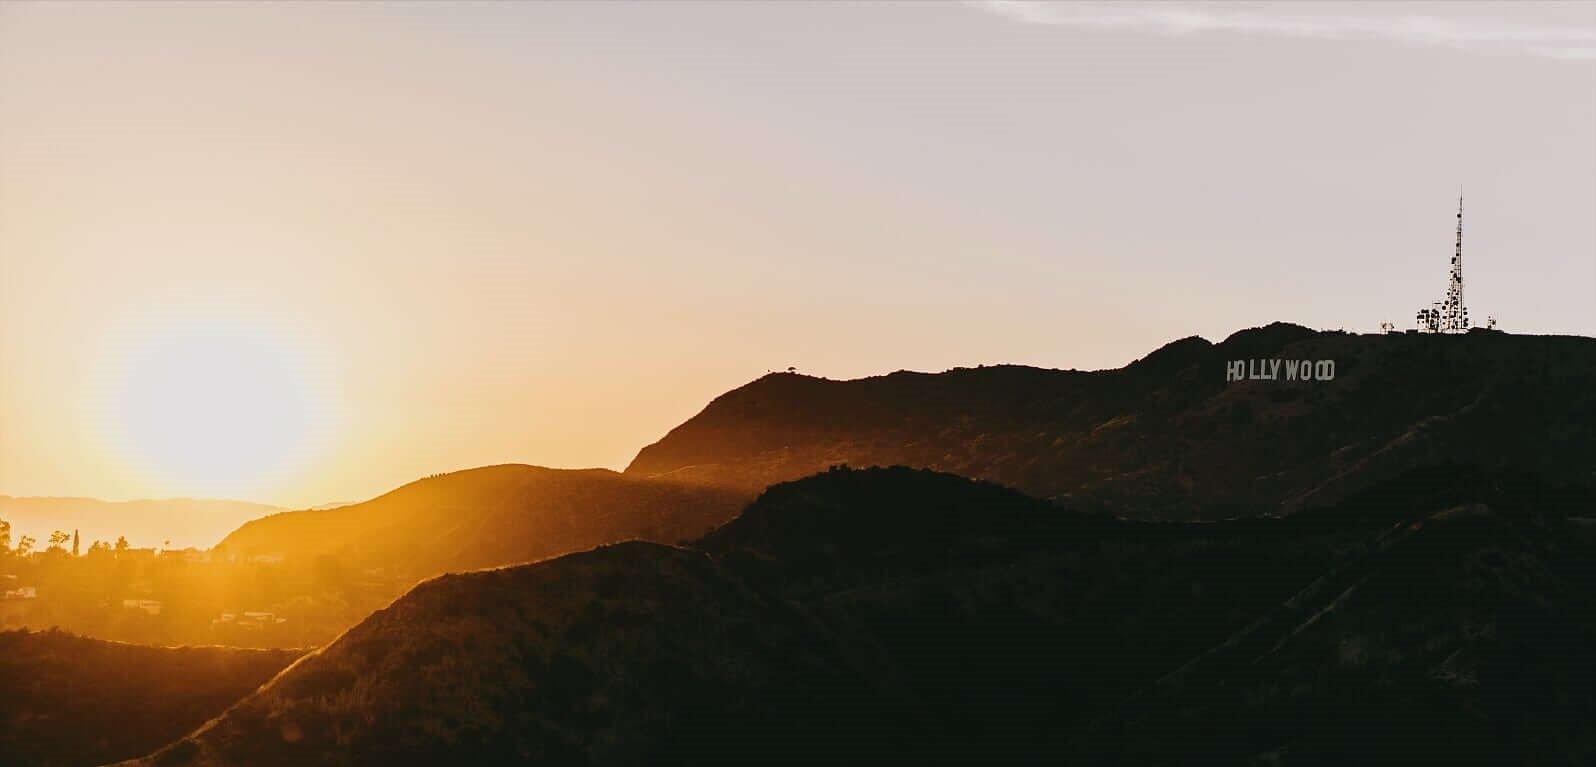 hollywood-sunset-1